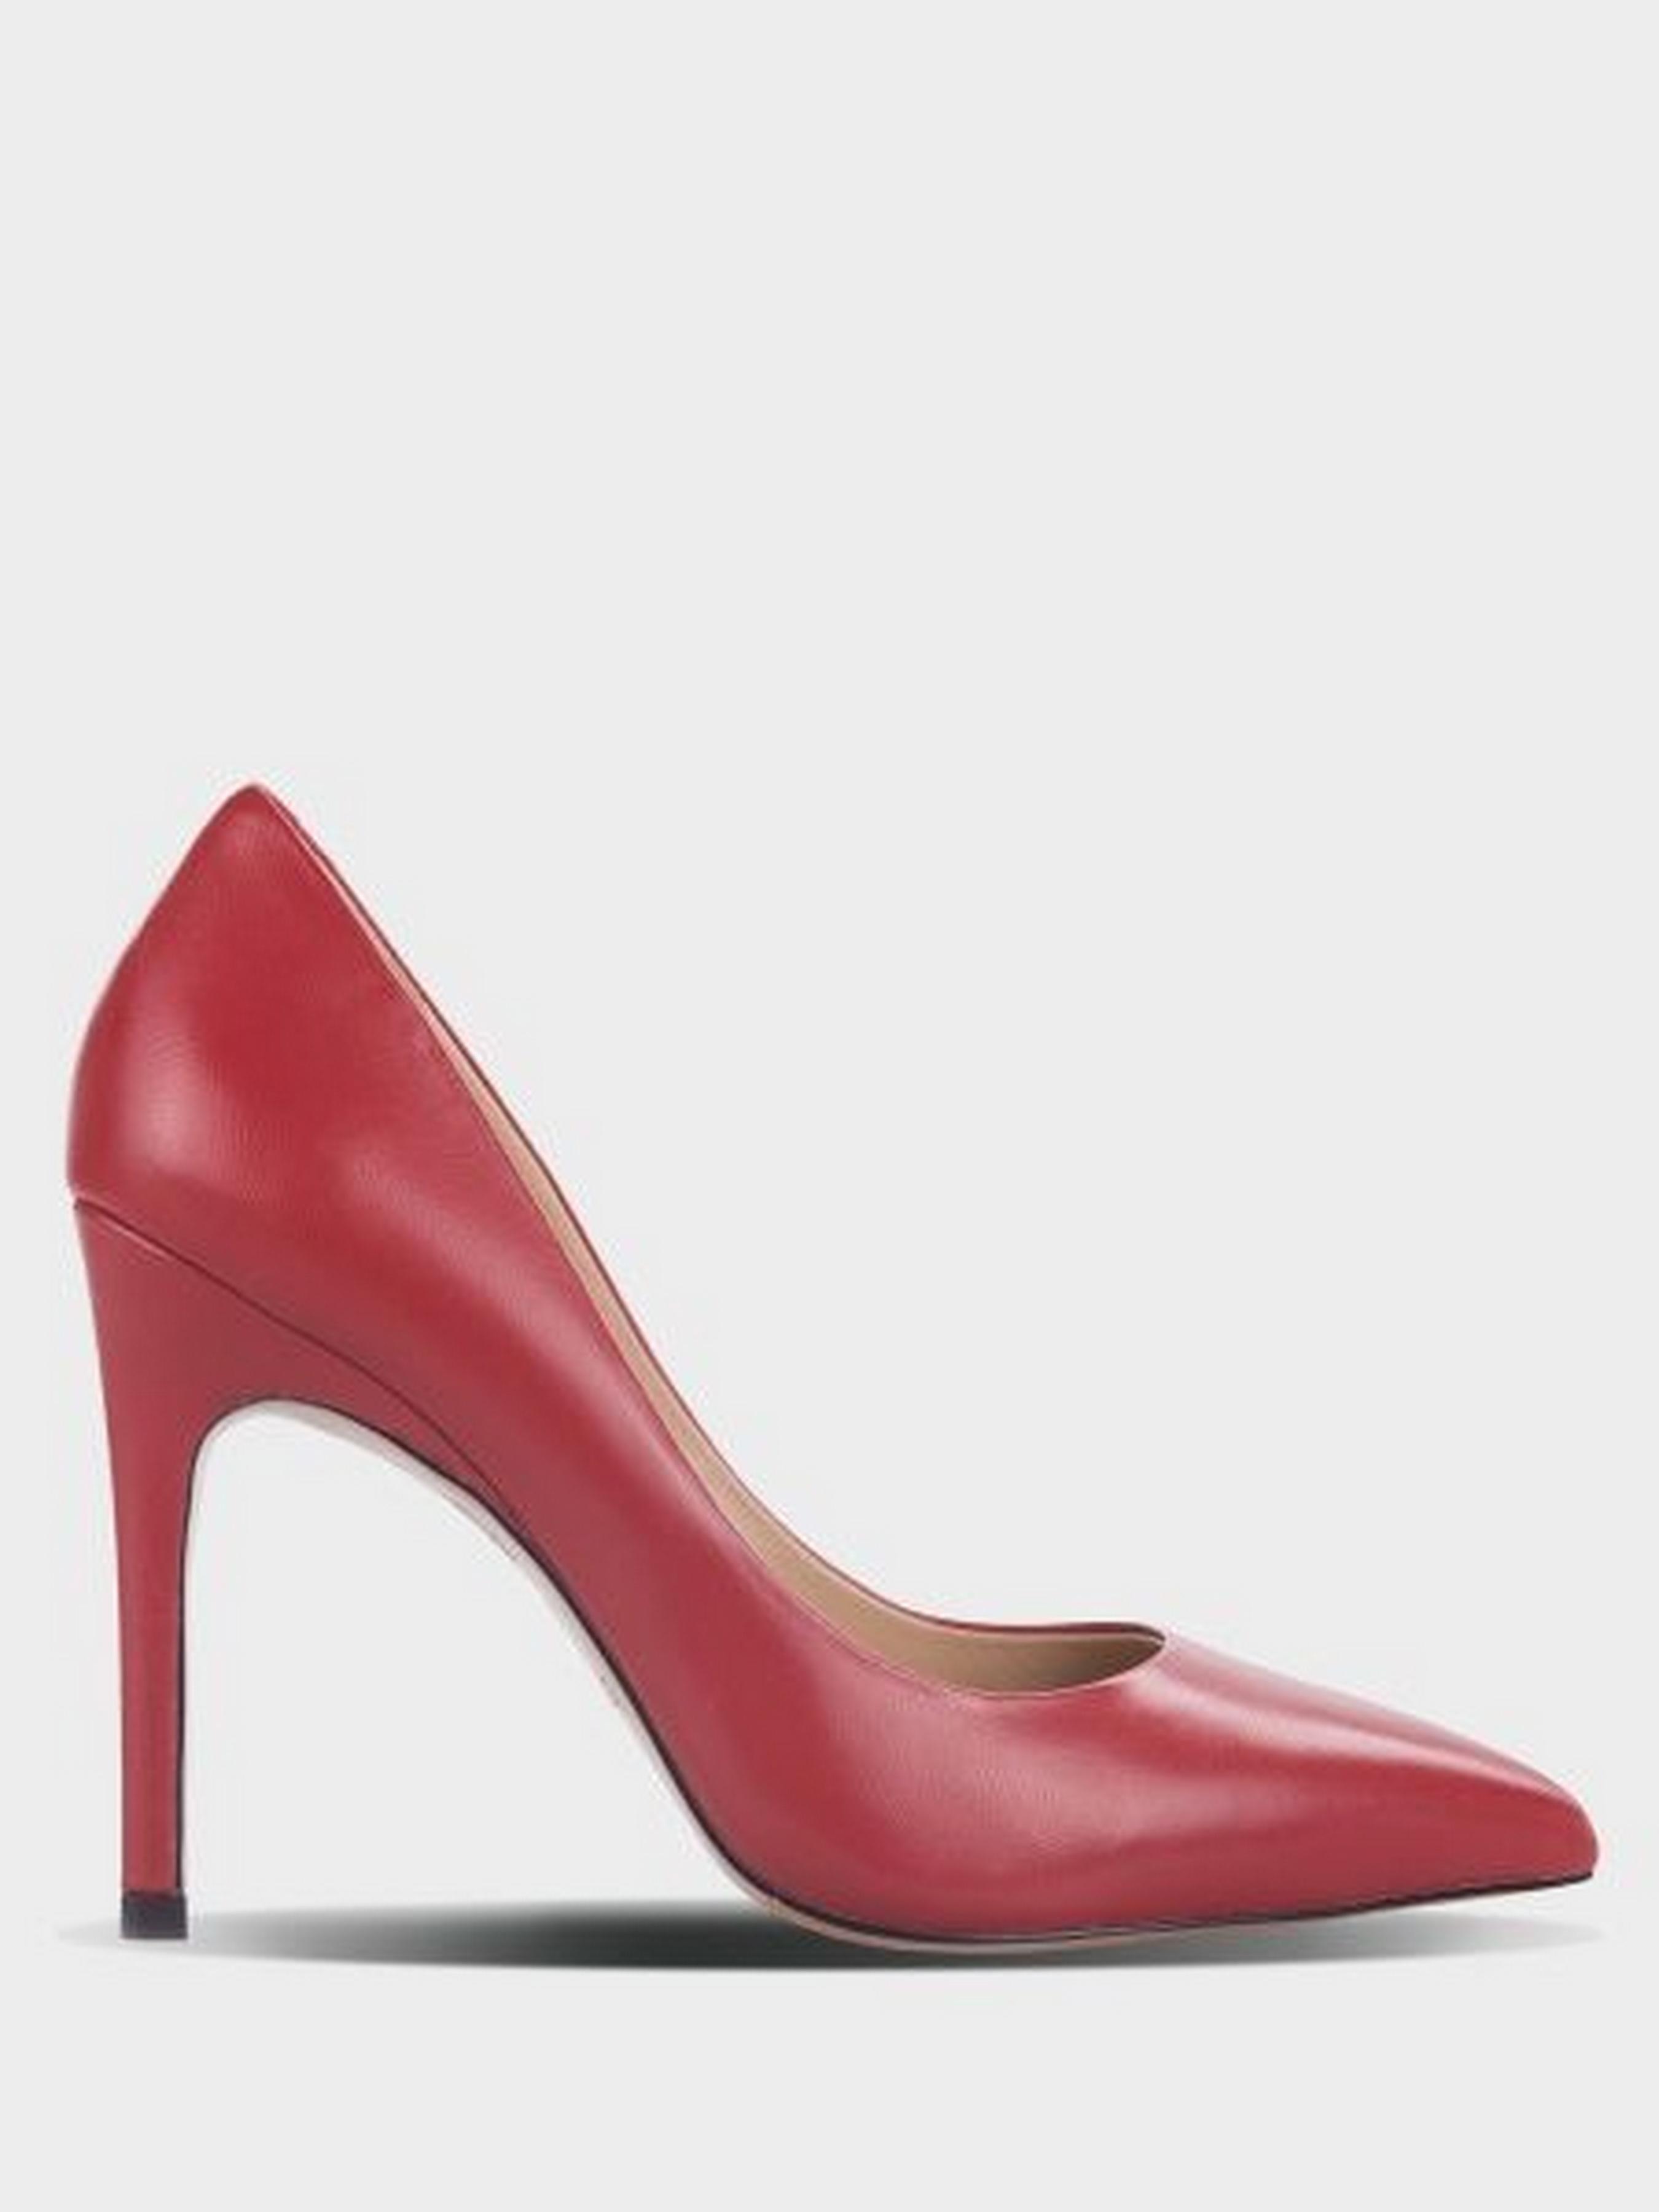 Туфли женские Braska туфлі жін.(36-41) BS3084 Заказать, 2017